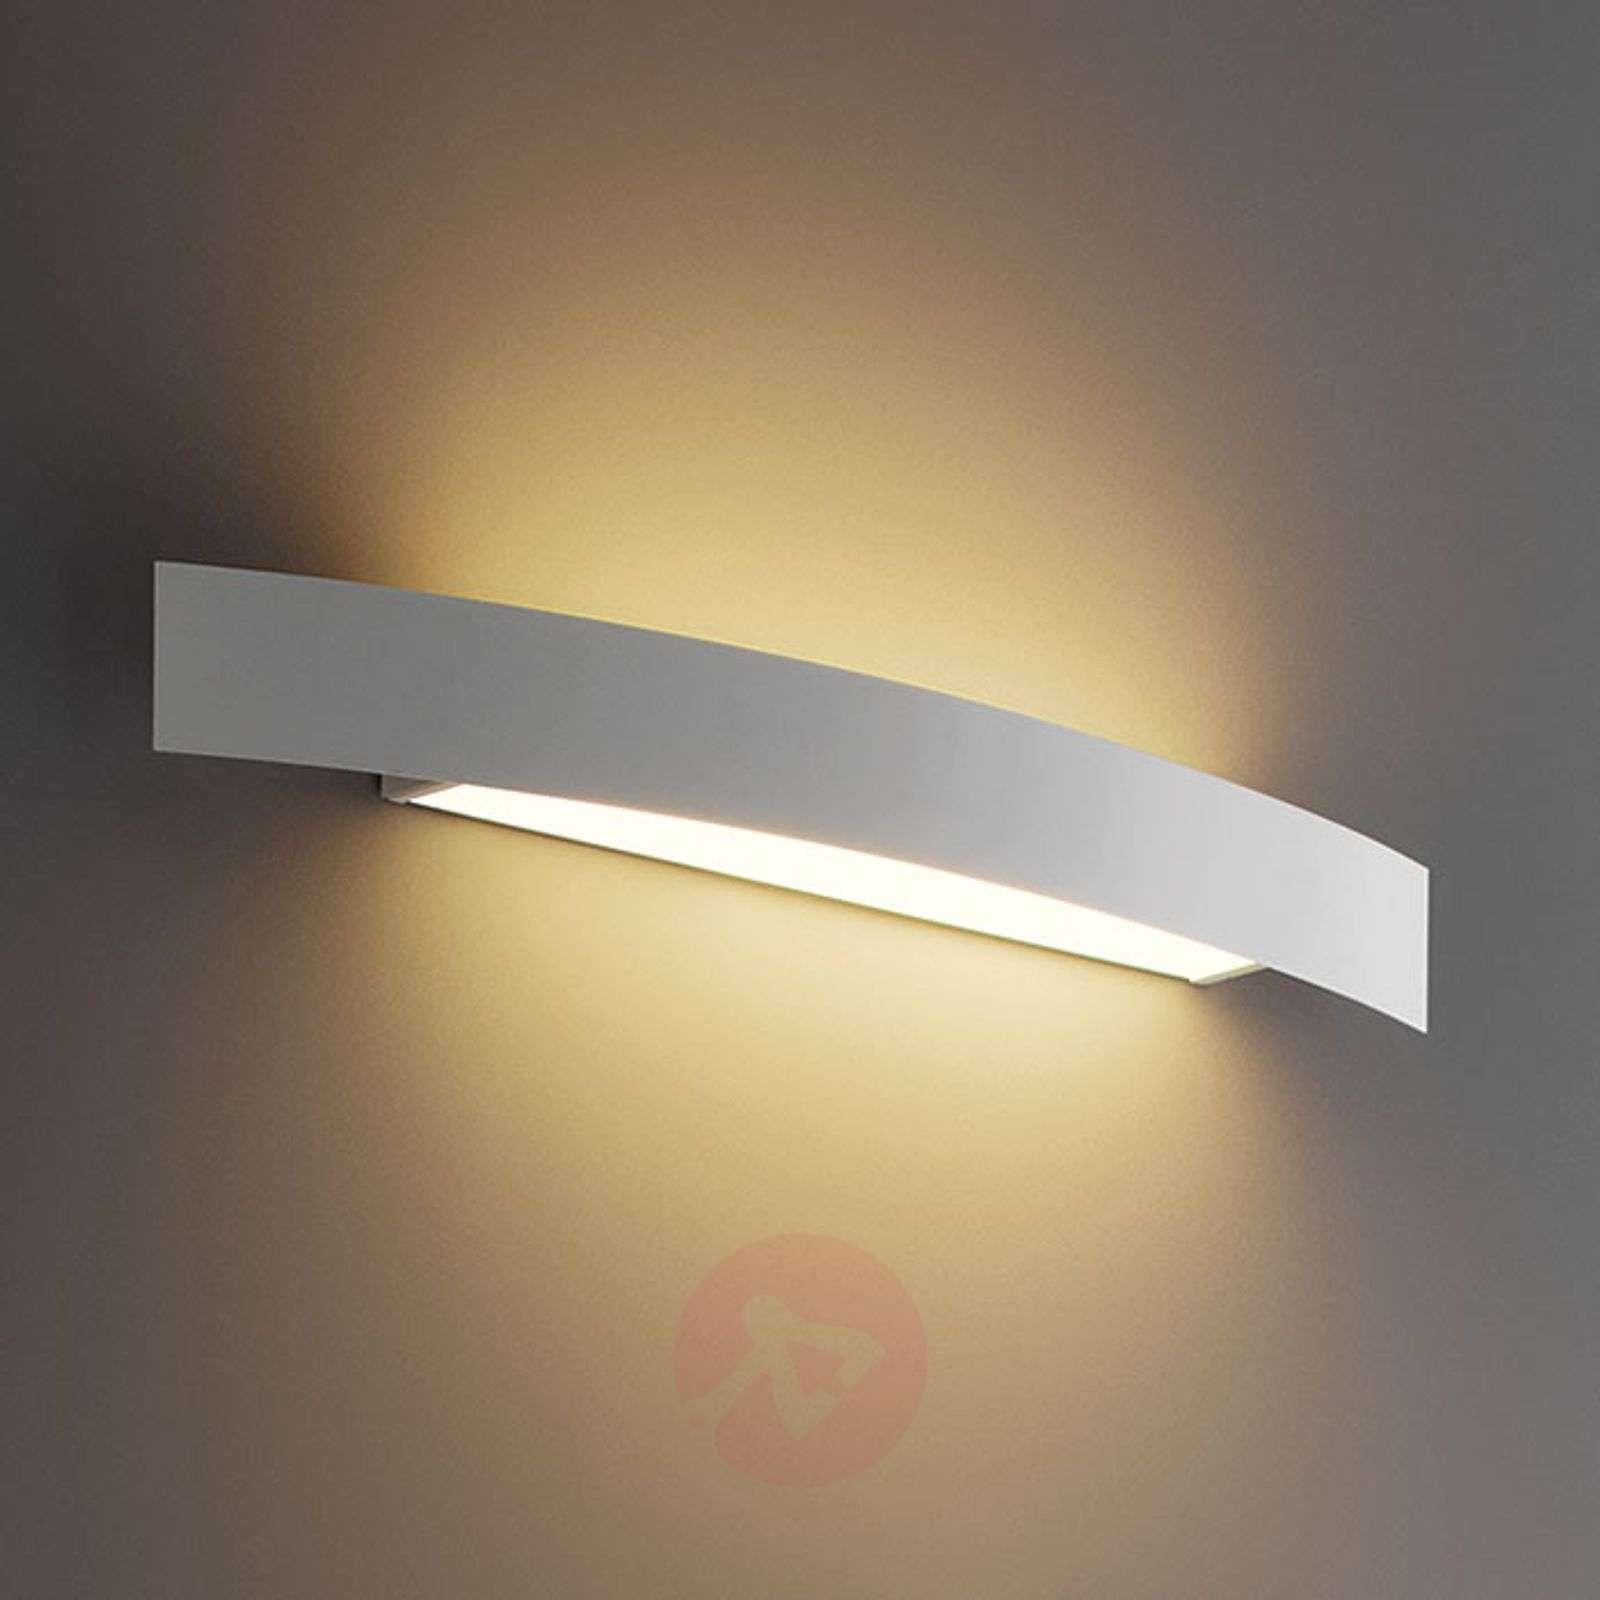 High-quality LED wall light Riga-3520385-05